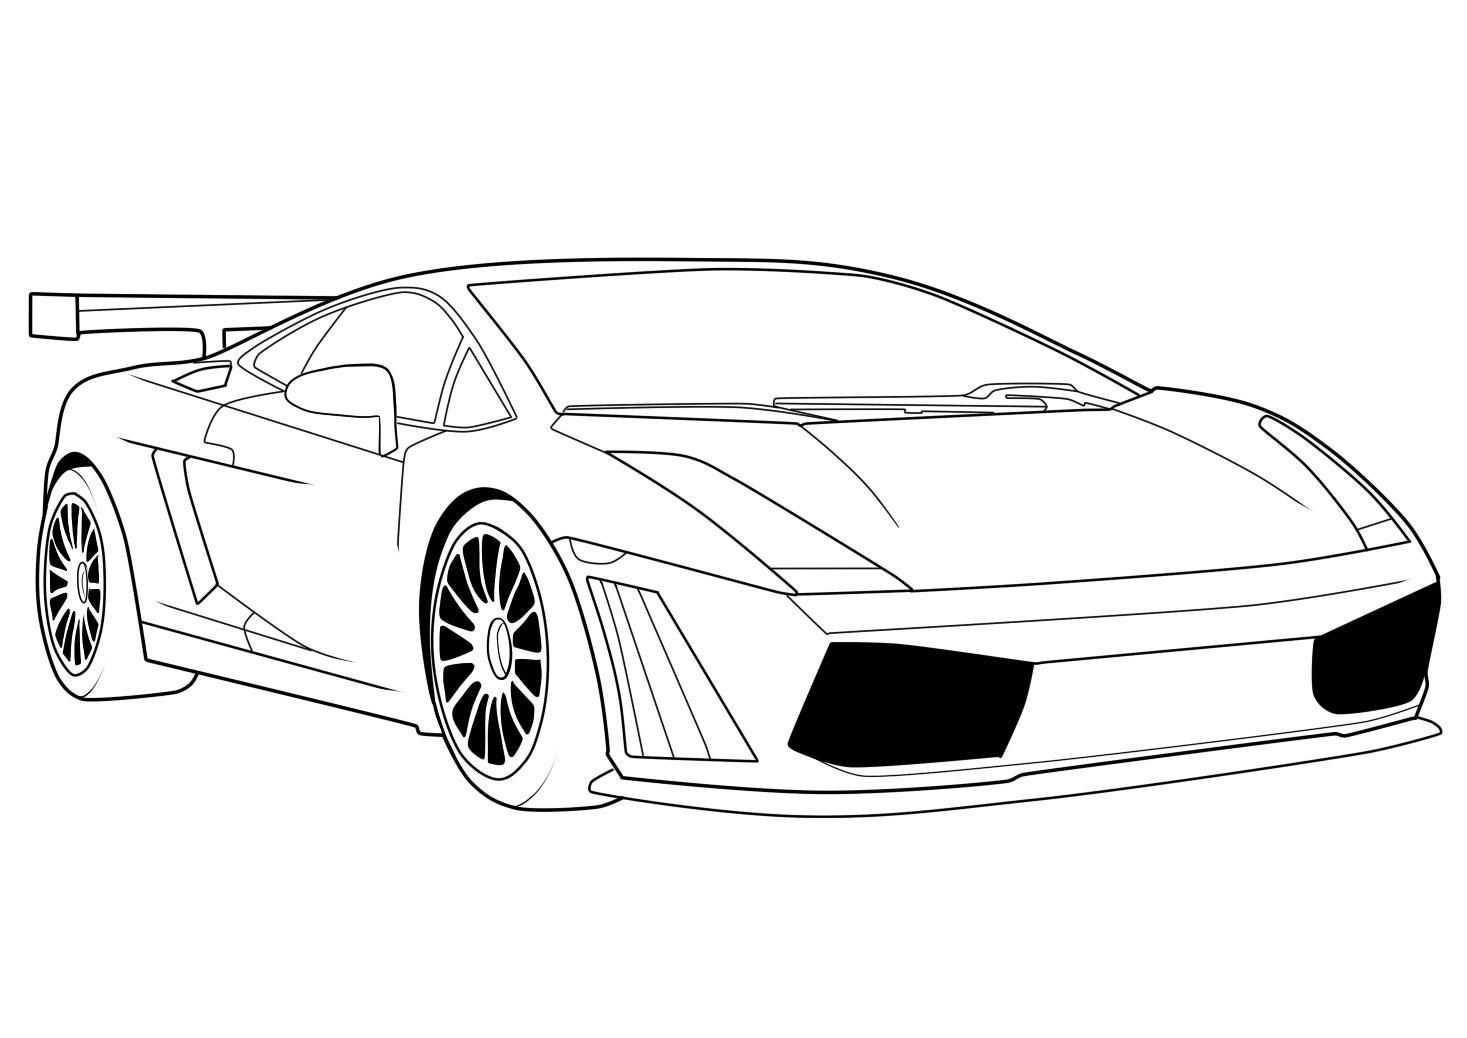 Lamborghini Coloring Page Hd Dengan Gambar Lamborghini Kartun